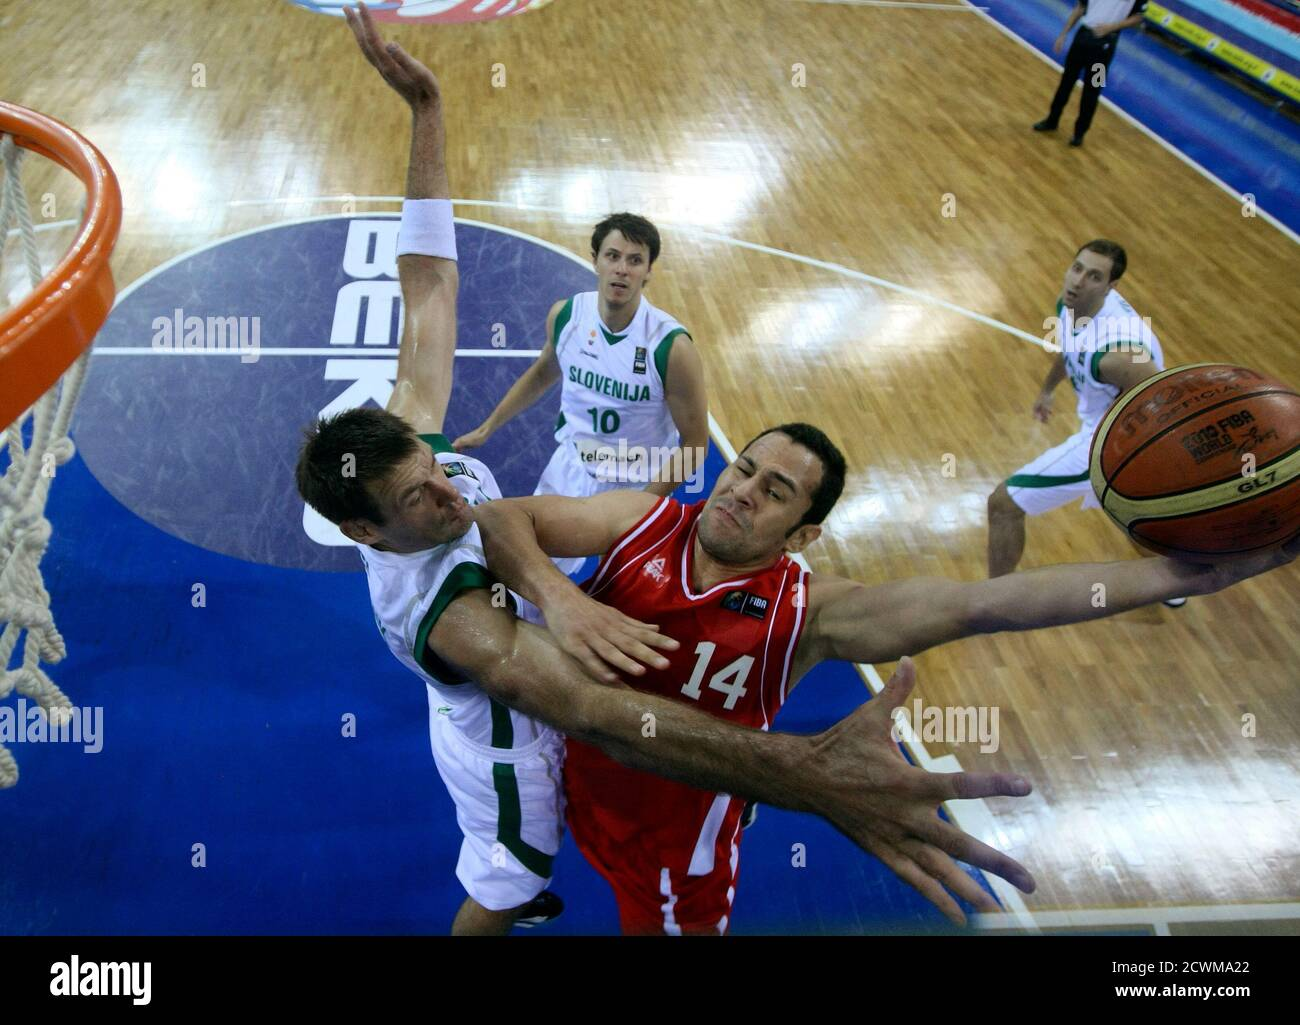 Iran's Saeid Davarpanahfard (centre R) goes up to shoot against Slovenia Goran Jagodnik during their FIBA Basketball World Championship game in Istanbul September 2, 2010.       REUTERS/Jeff Haynes (TURKEY  - Tags: SPORT BASKETBALL) Stock Photo